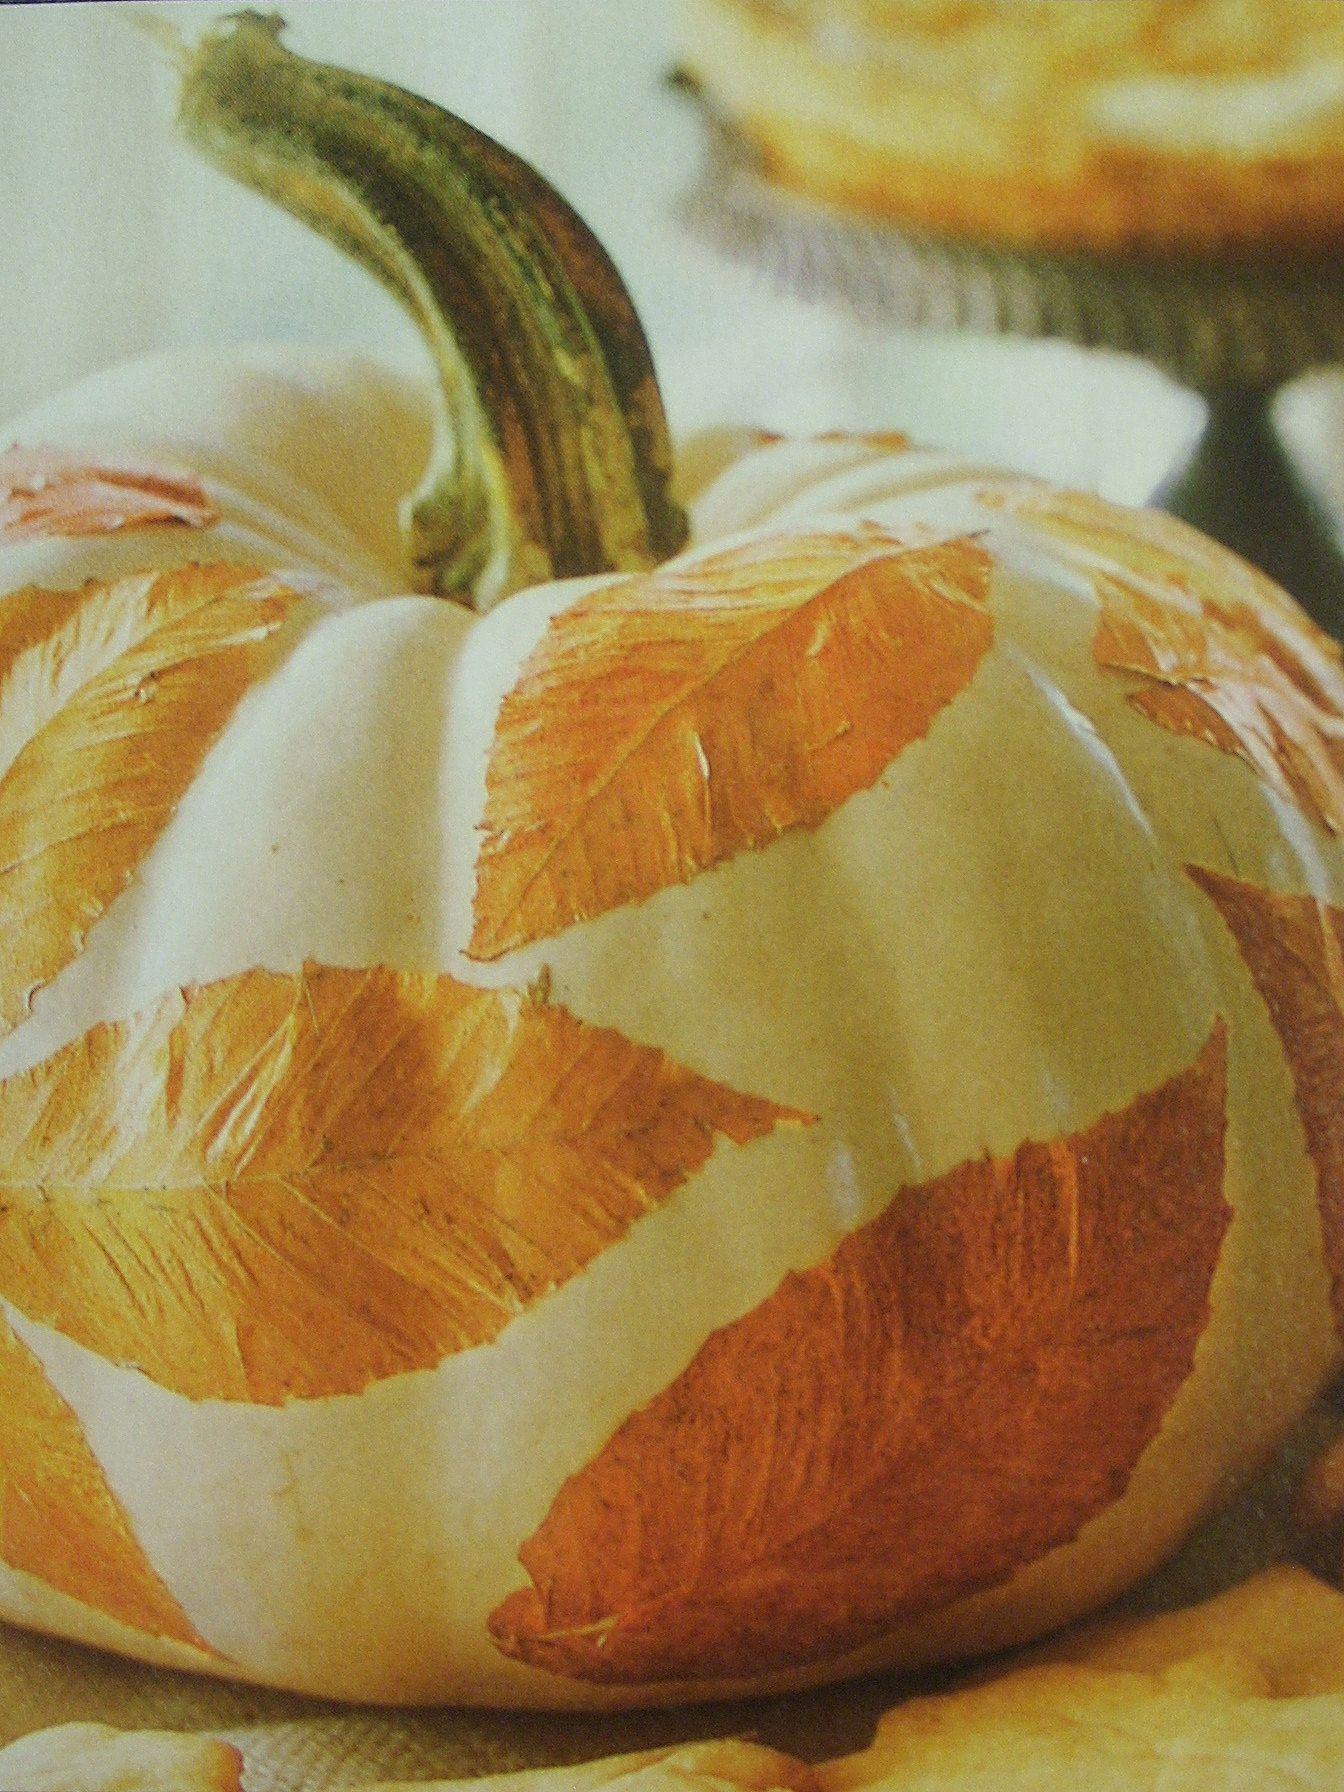 Mod podge fall leaves on a pumpkin | Fall Decorating Ideas ...